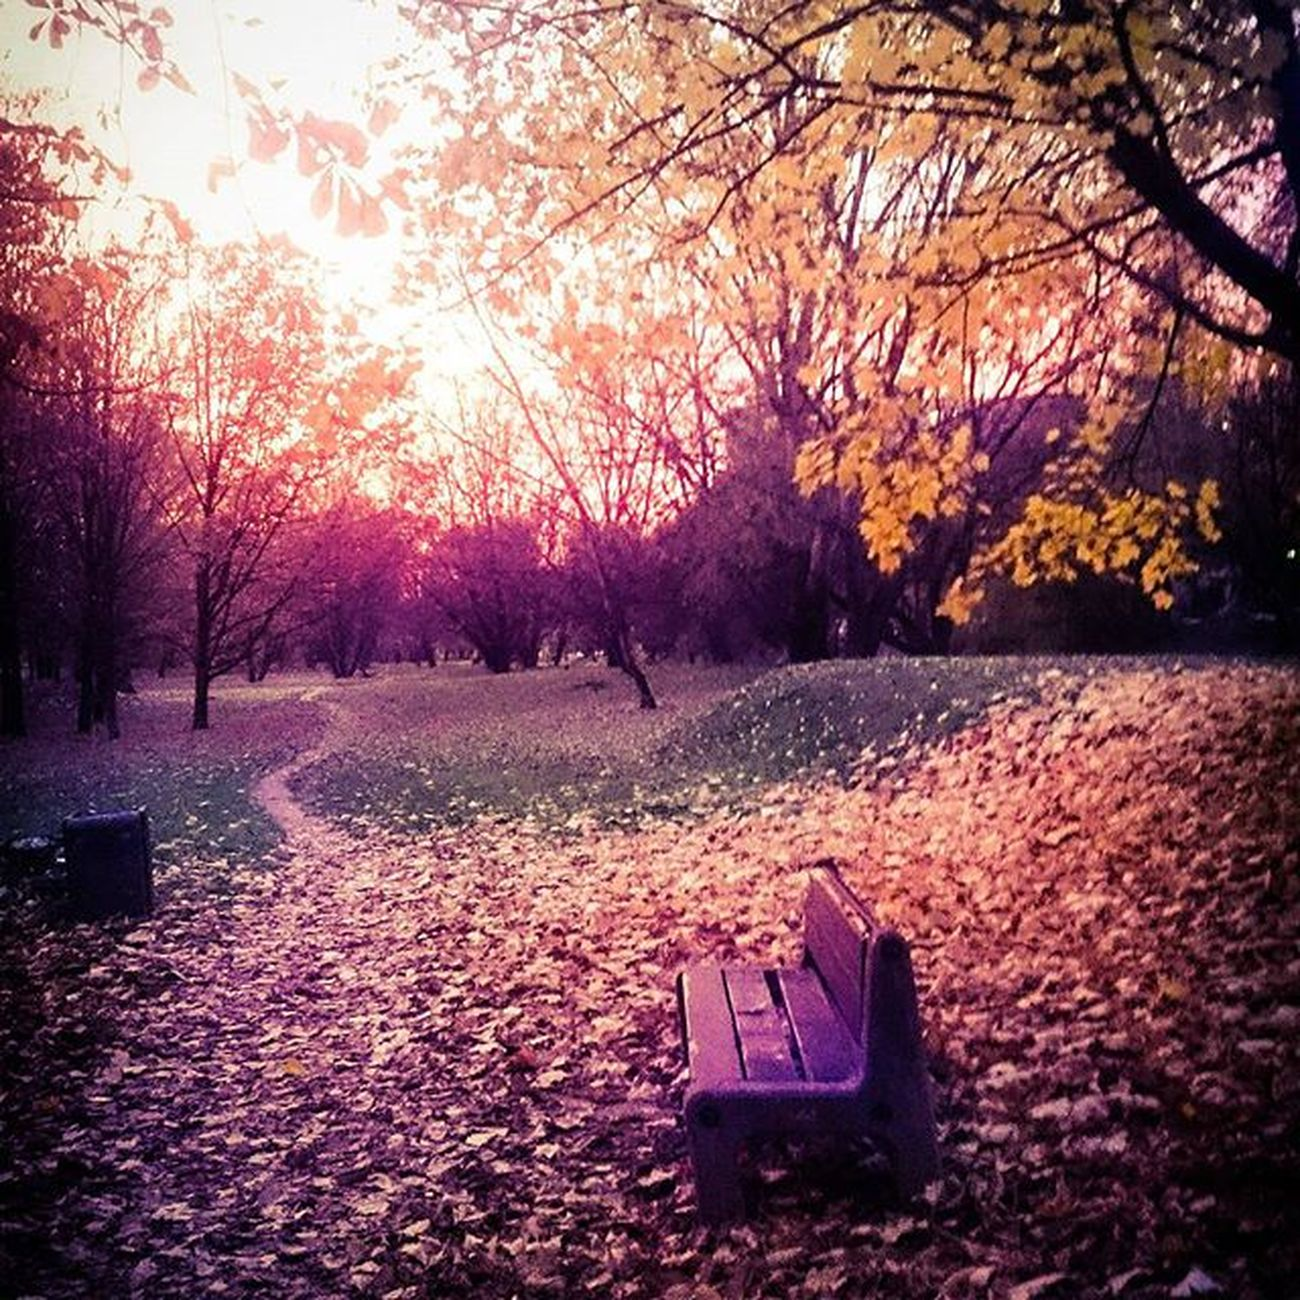 Dolinkasluzewiecka Sluzew Warszawa  Warsaw Mood Autumn Allsaints AllSaintsDay